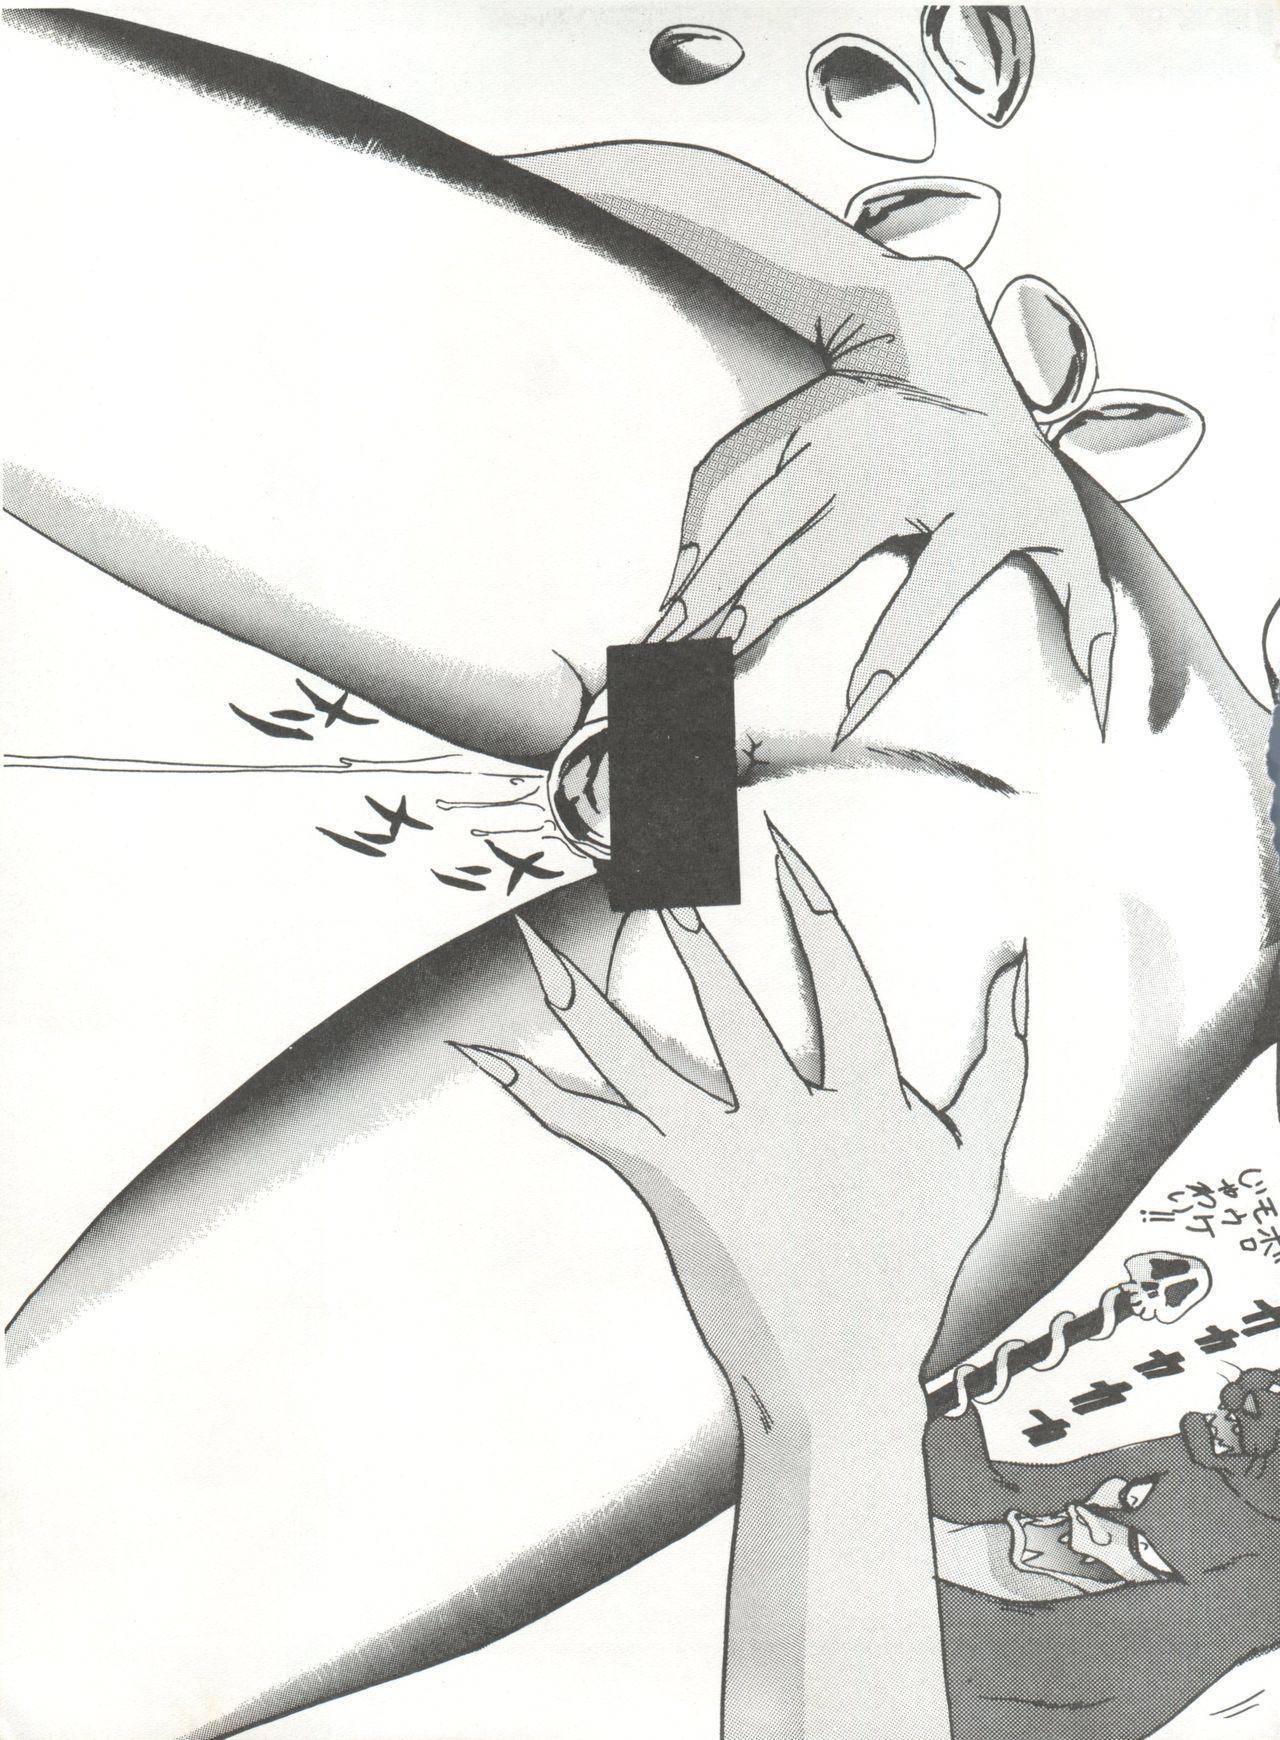 [Global One (MARO)] Sadistic 5 (Cutey Honey, Devilman, Sailor Moon), [Global One (MARO)] Sadistic (Dirty Pair, Fushigi no Umi no Nadia, Sailor Moon), [Studio Ikkatsumajin] .ribbon (Hime-chan's Ribbon) 32